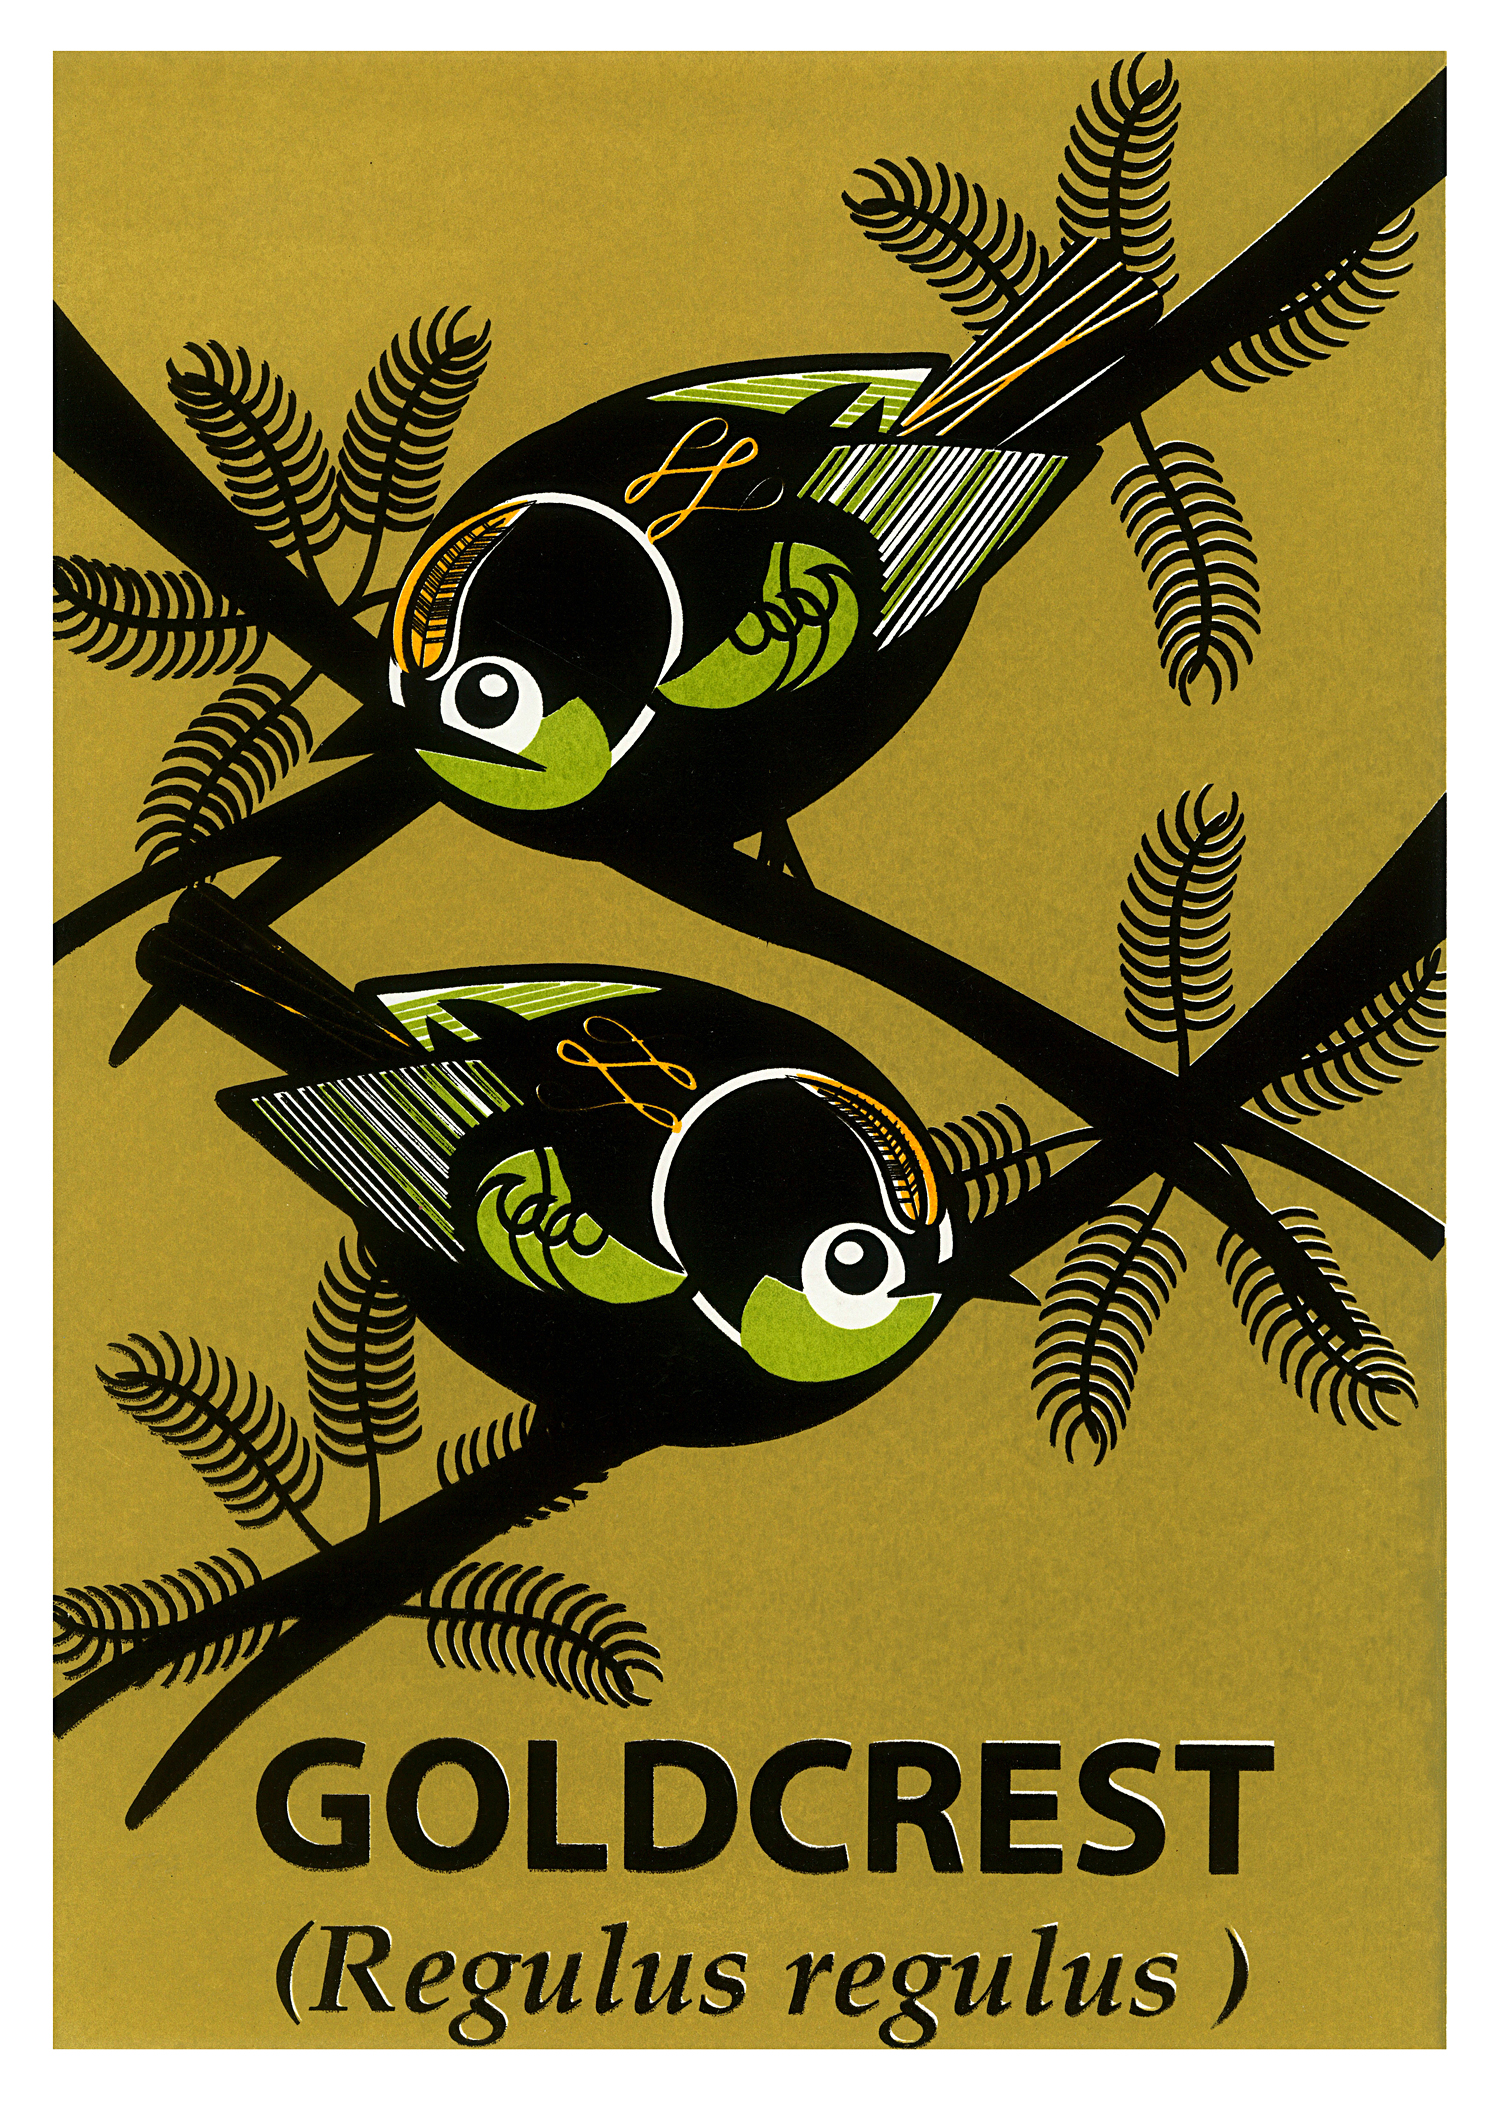 Limited Edition Goldcrest Screenprint